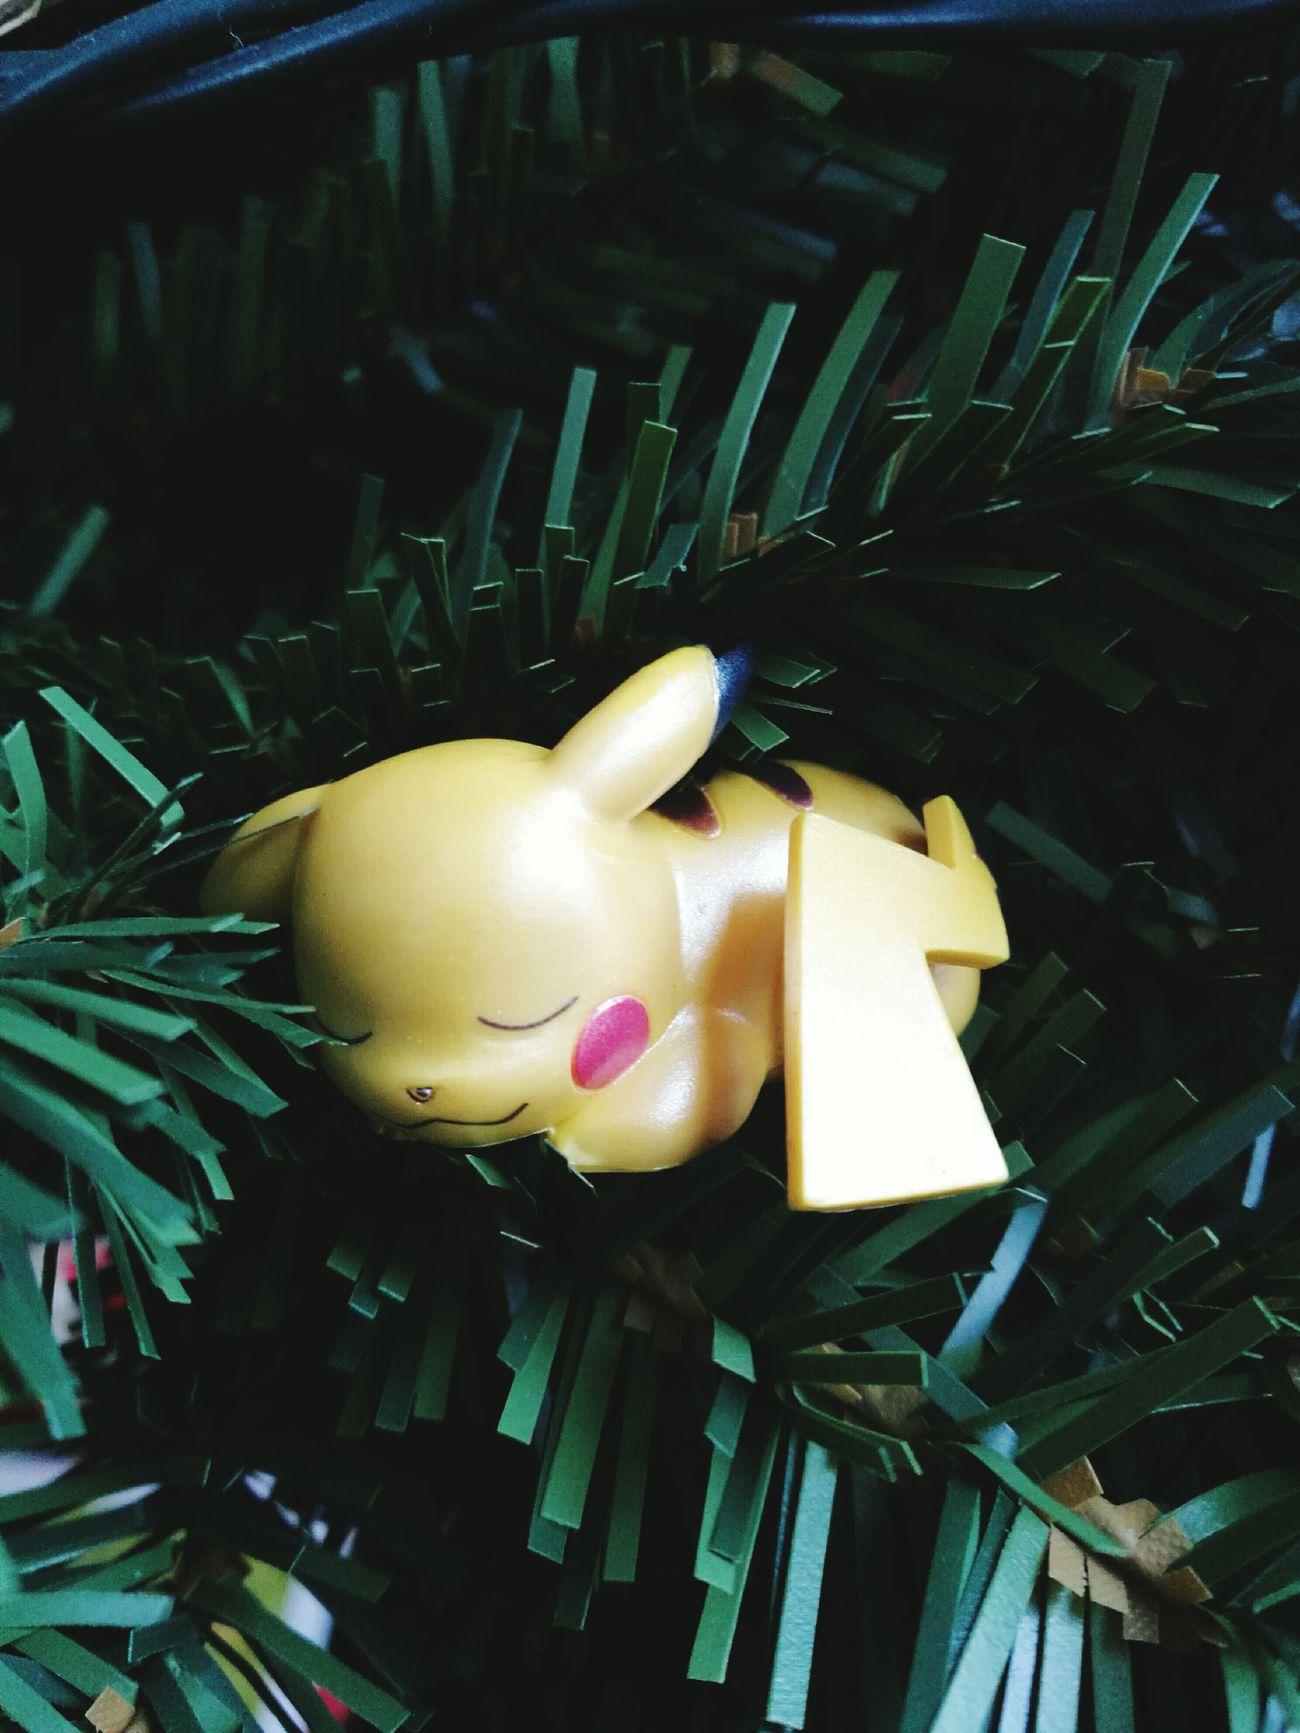 Close-up Day Pikachu Christmas Tree